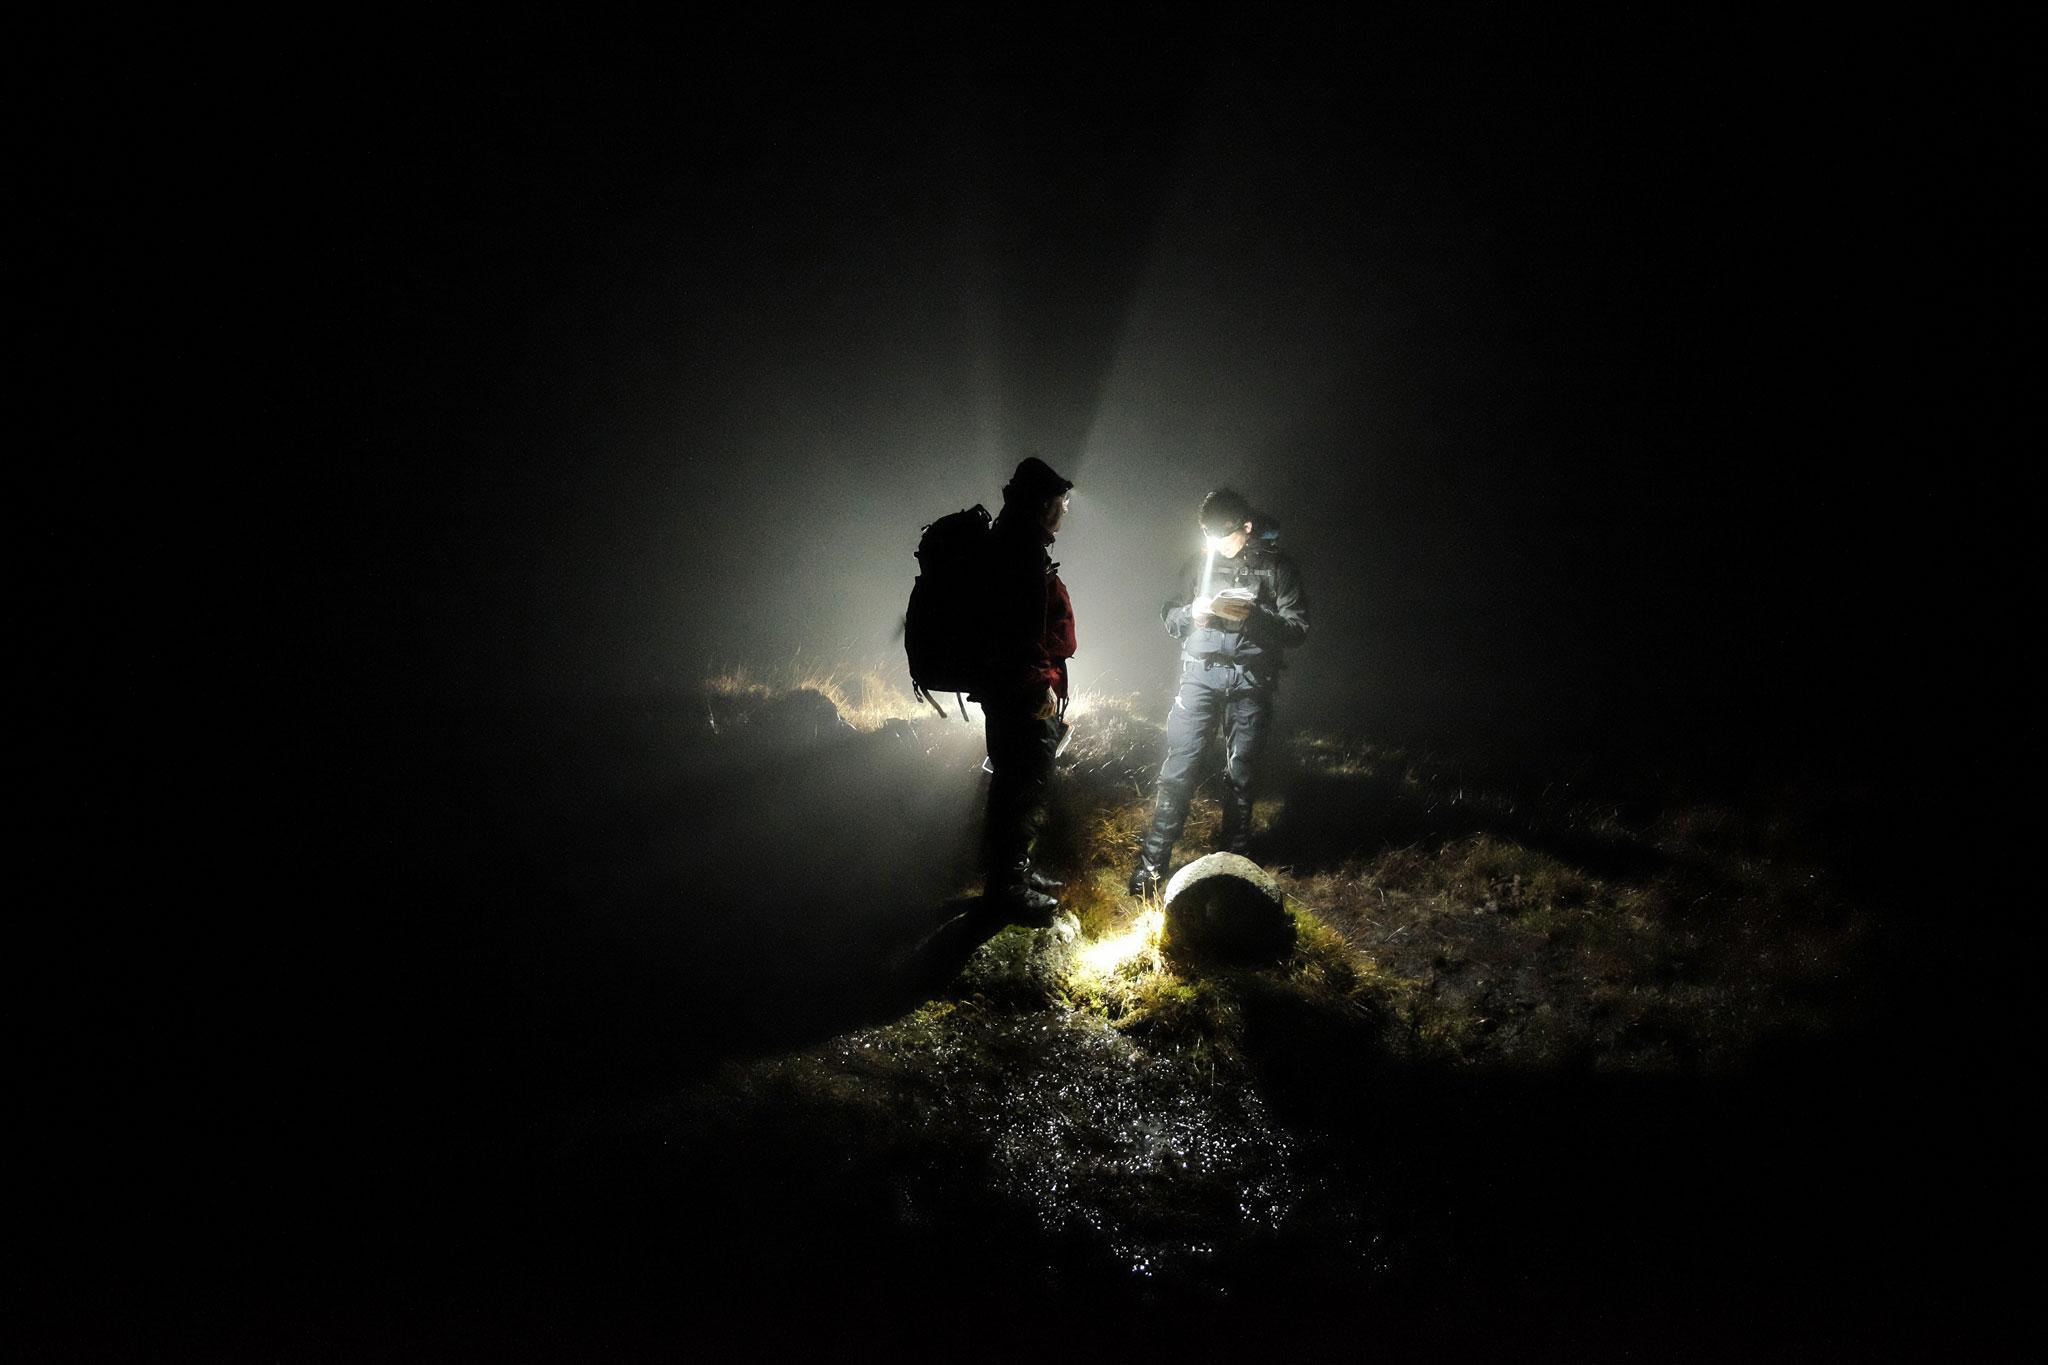 Walking in Bad Conditions on Dartmoor